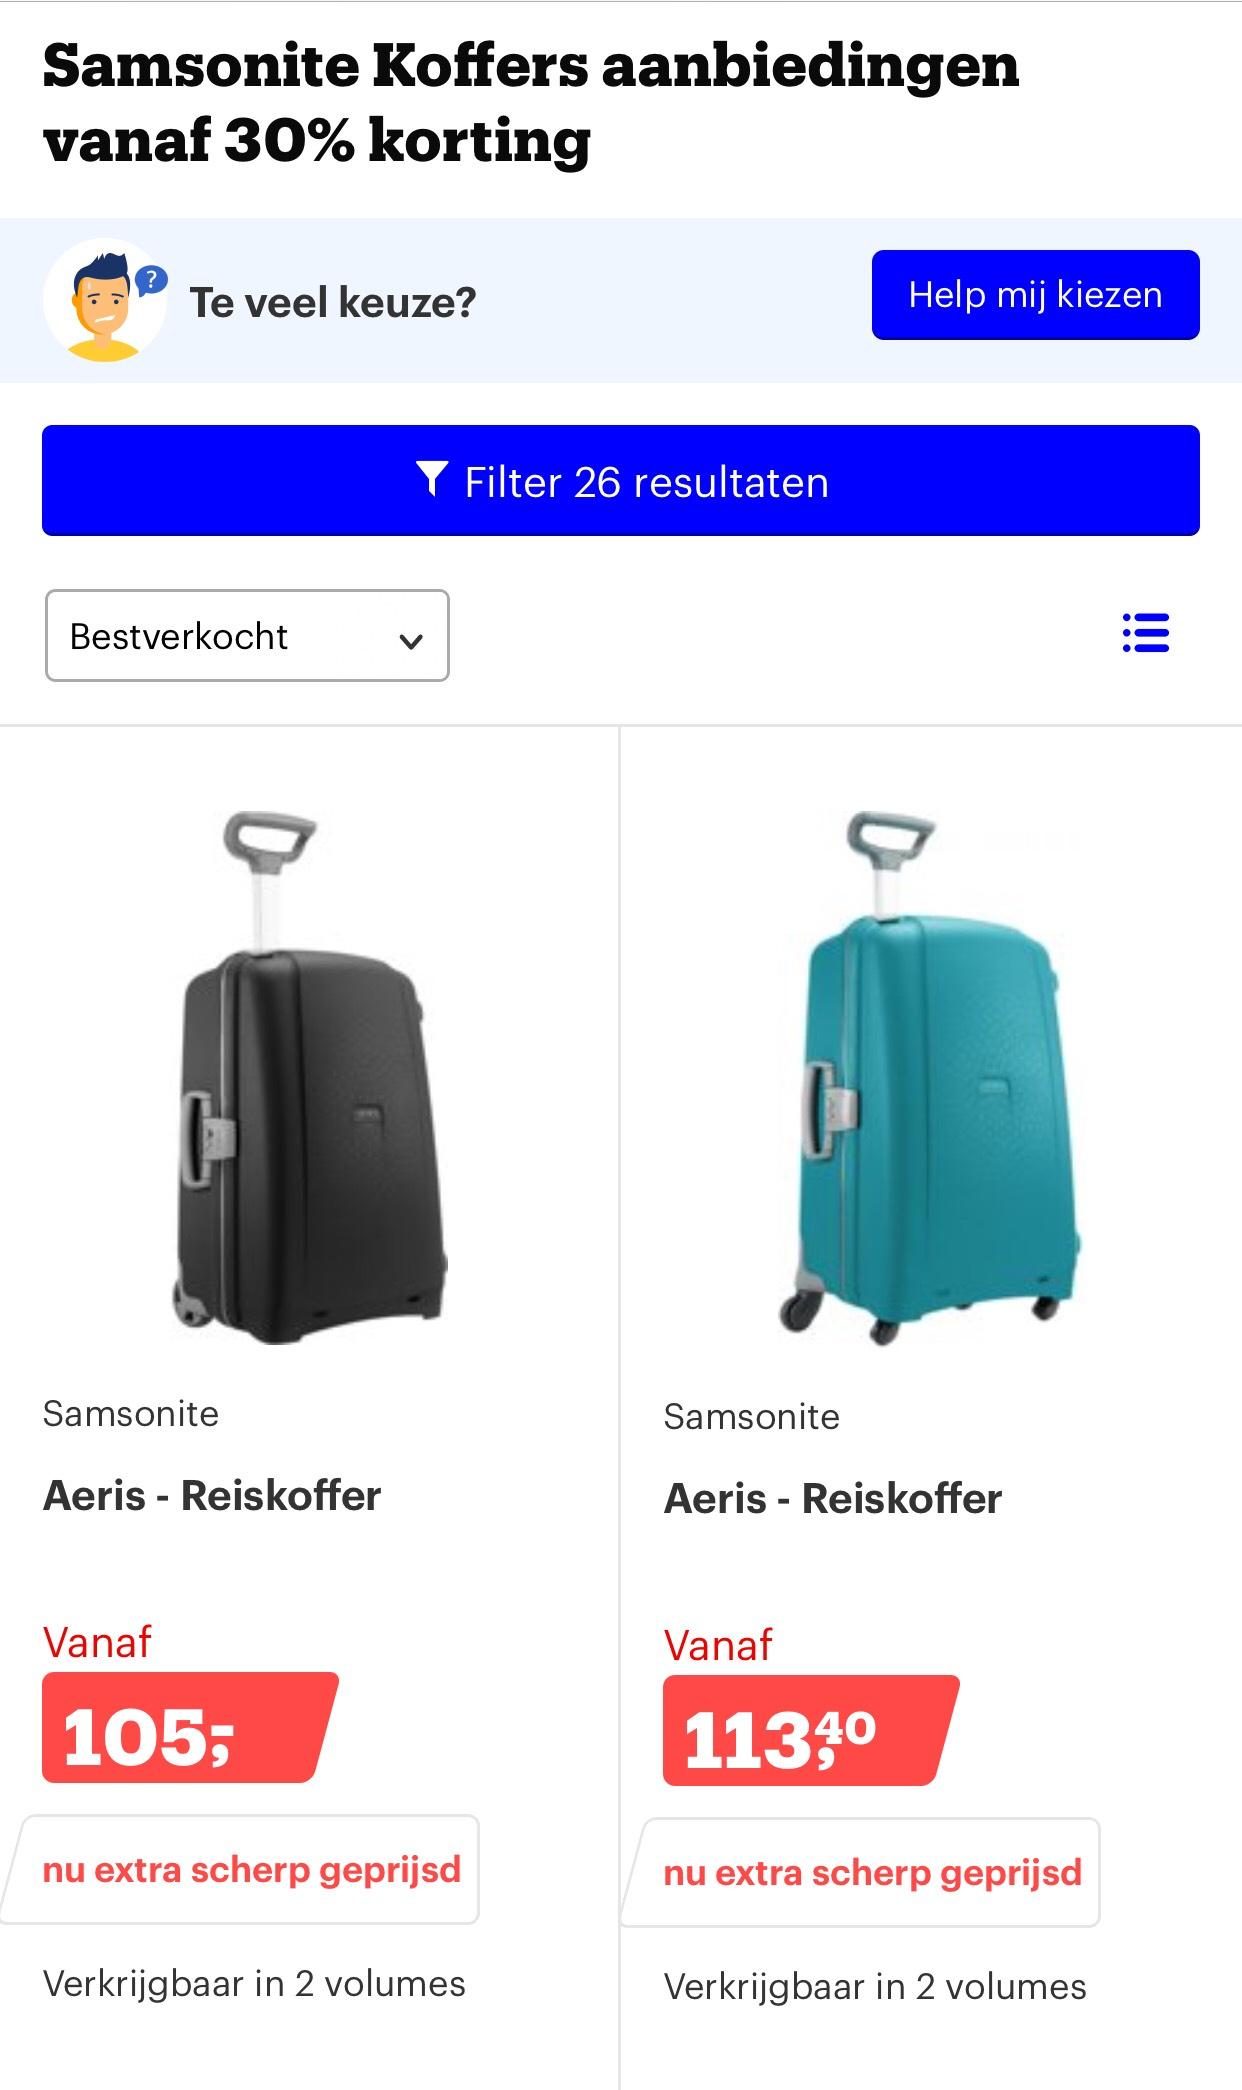 Samsonite 30% of meer korting op koffers (bol.com)